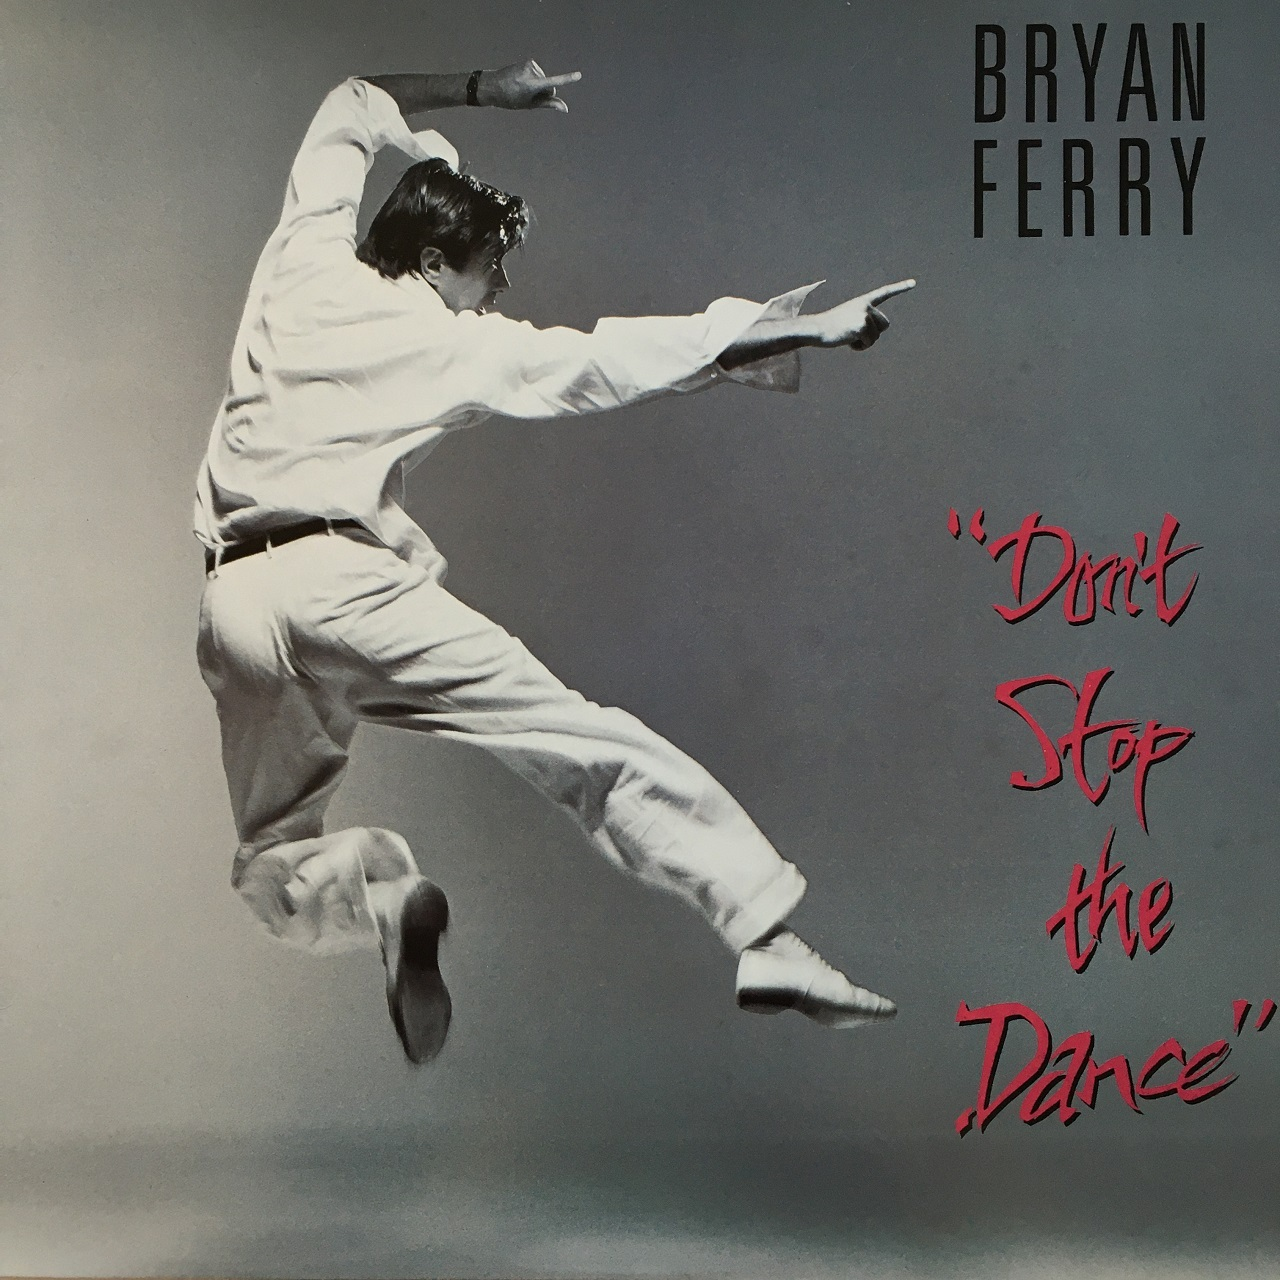 【12inch・国内盤】ブライアン・フェリー / ドント・ストップ・ザ・ダンス(スペシャル・リミックス・ヴァージョン)